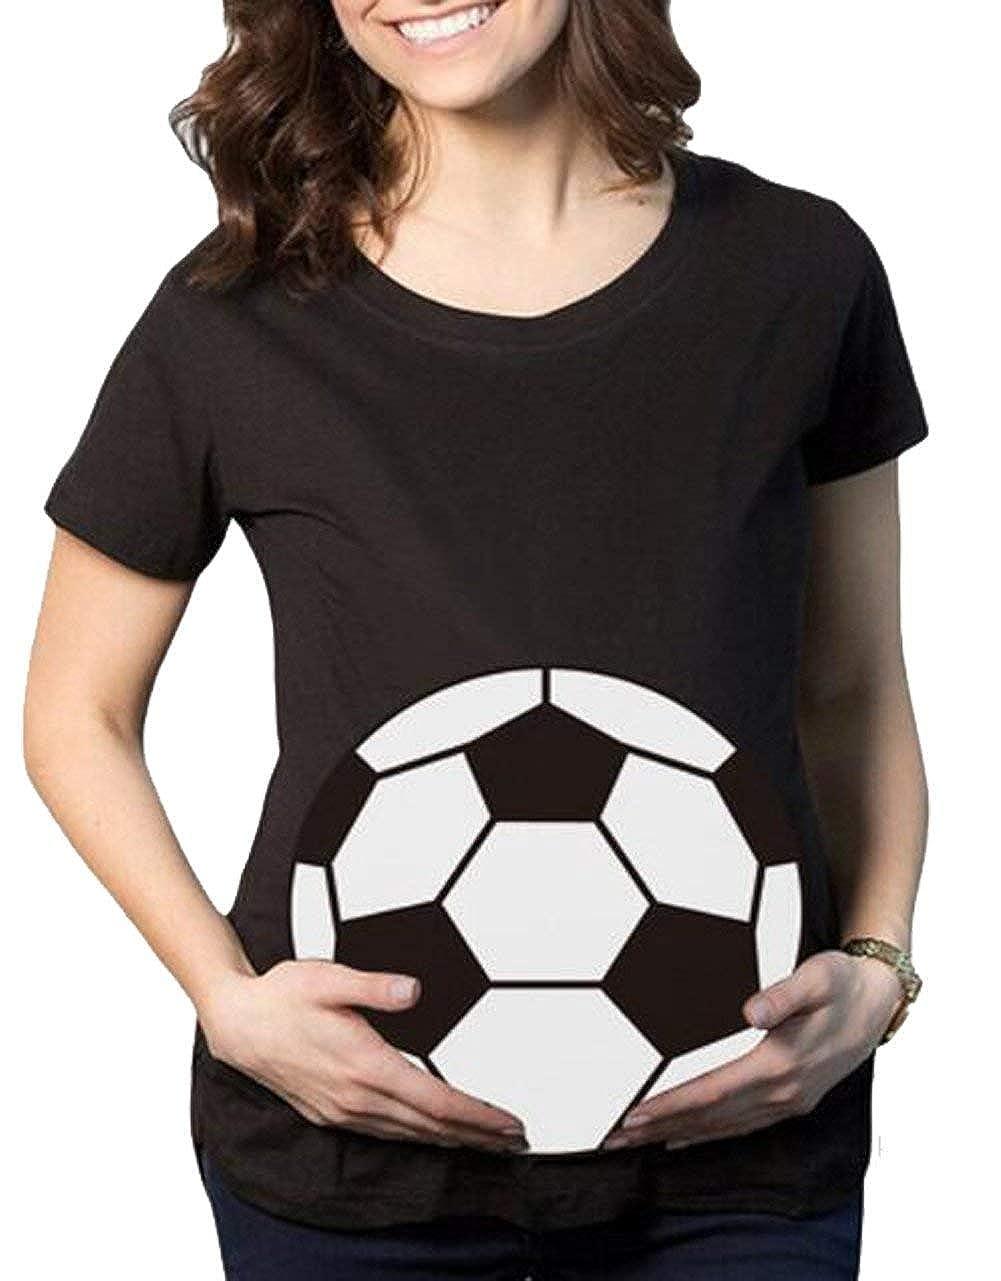 106c6ba1f0649 Amazon.com: naivety Womens Maternity Football Printed Shirt Summer Short  Sleeve Round Neck T-Shirt Tee: Clothing